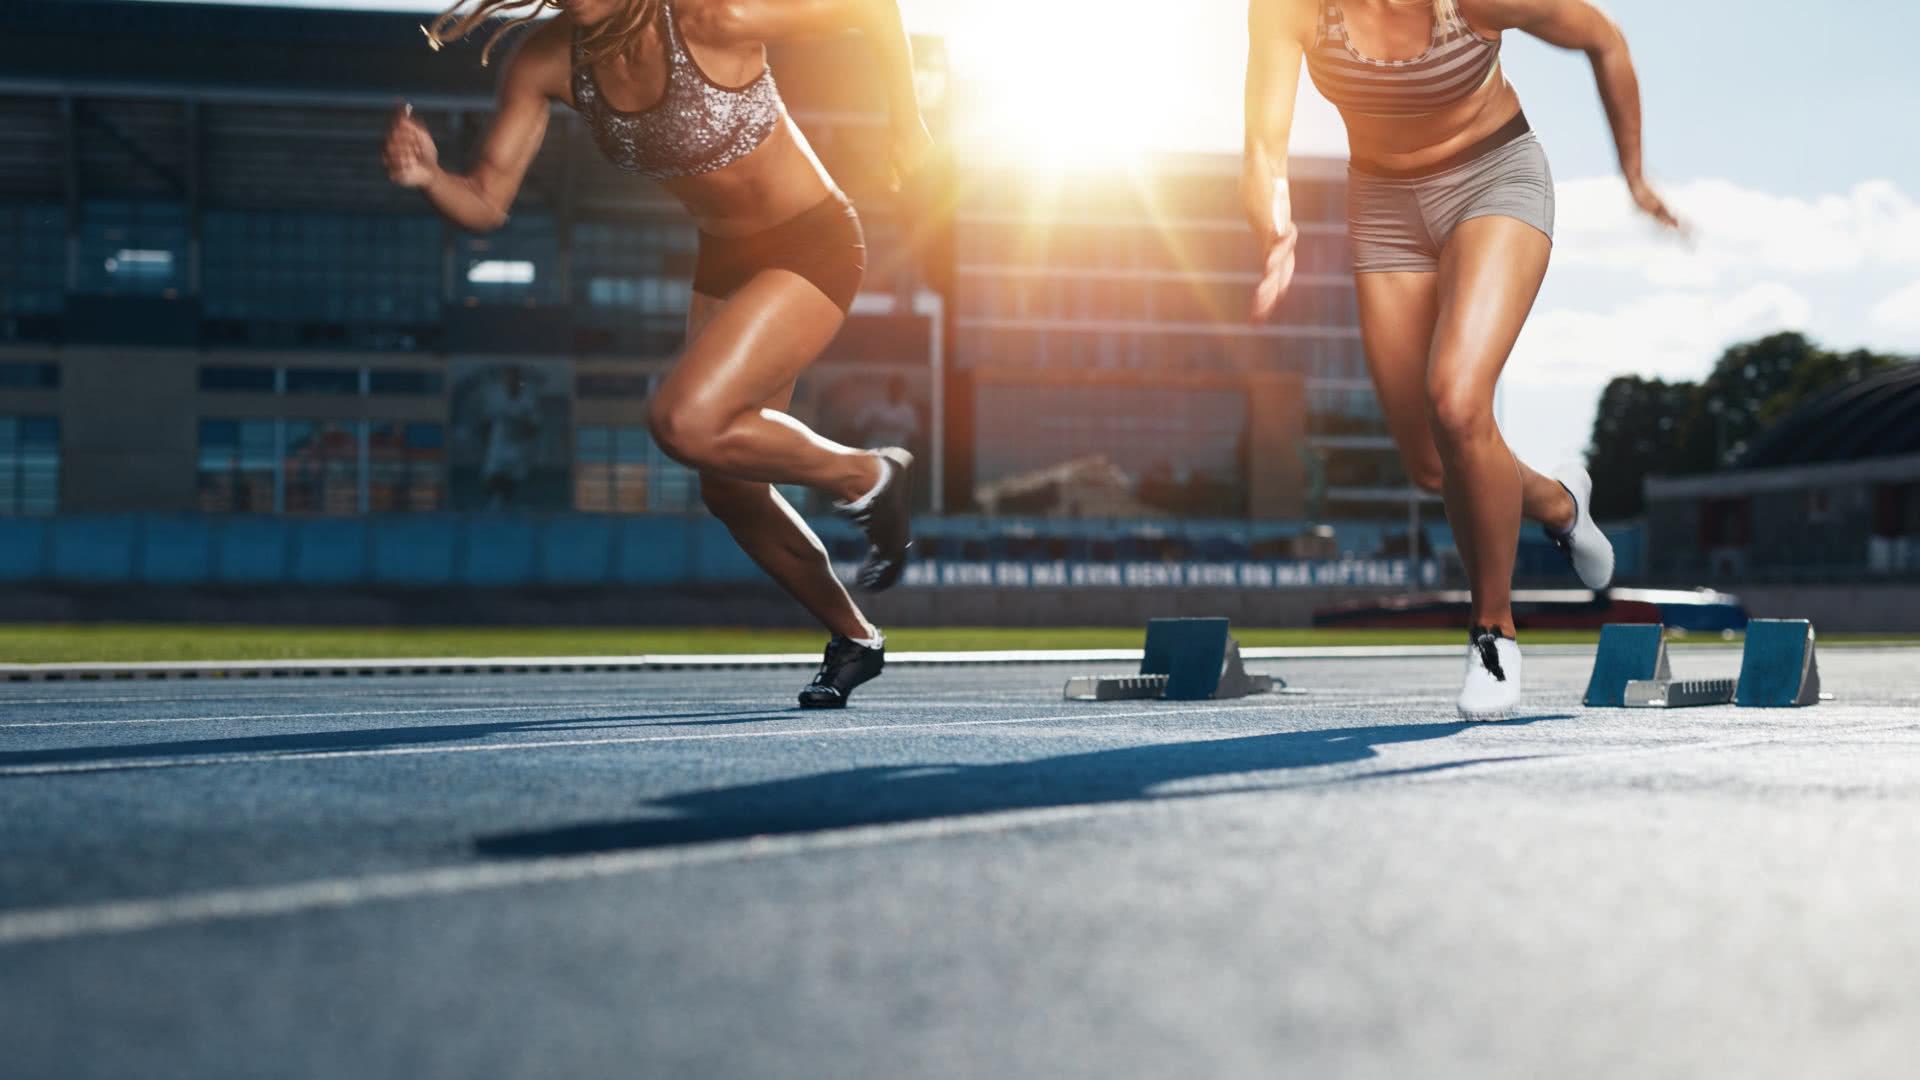 Sportfocus Kilpajuoksu